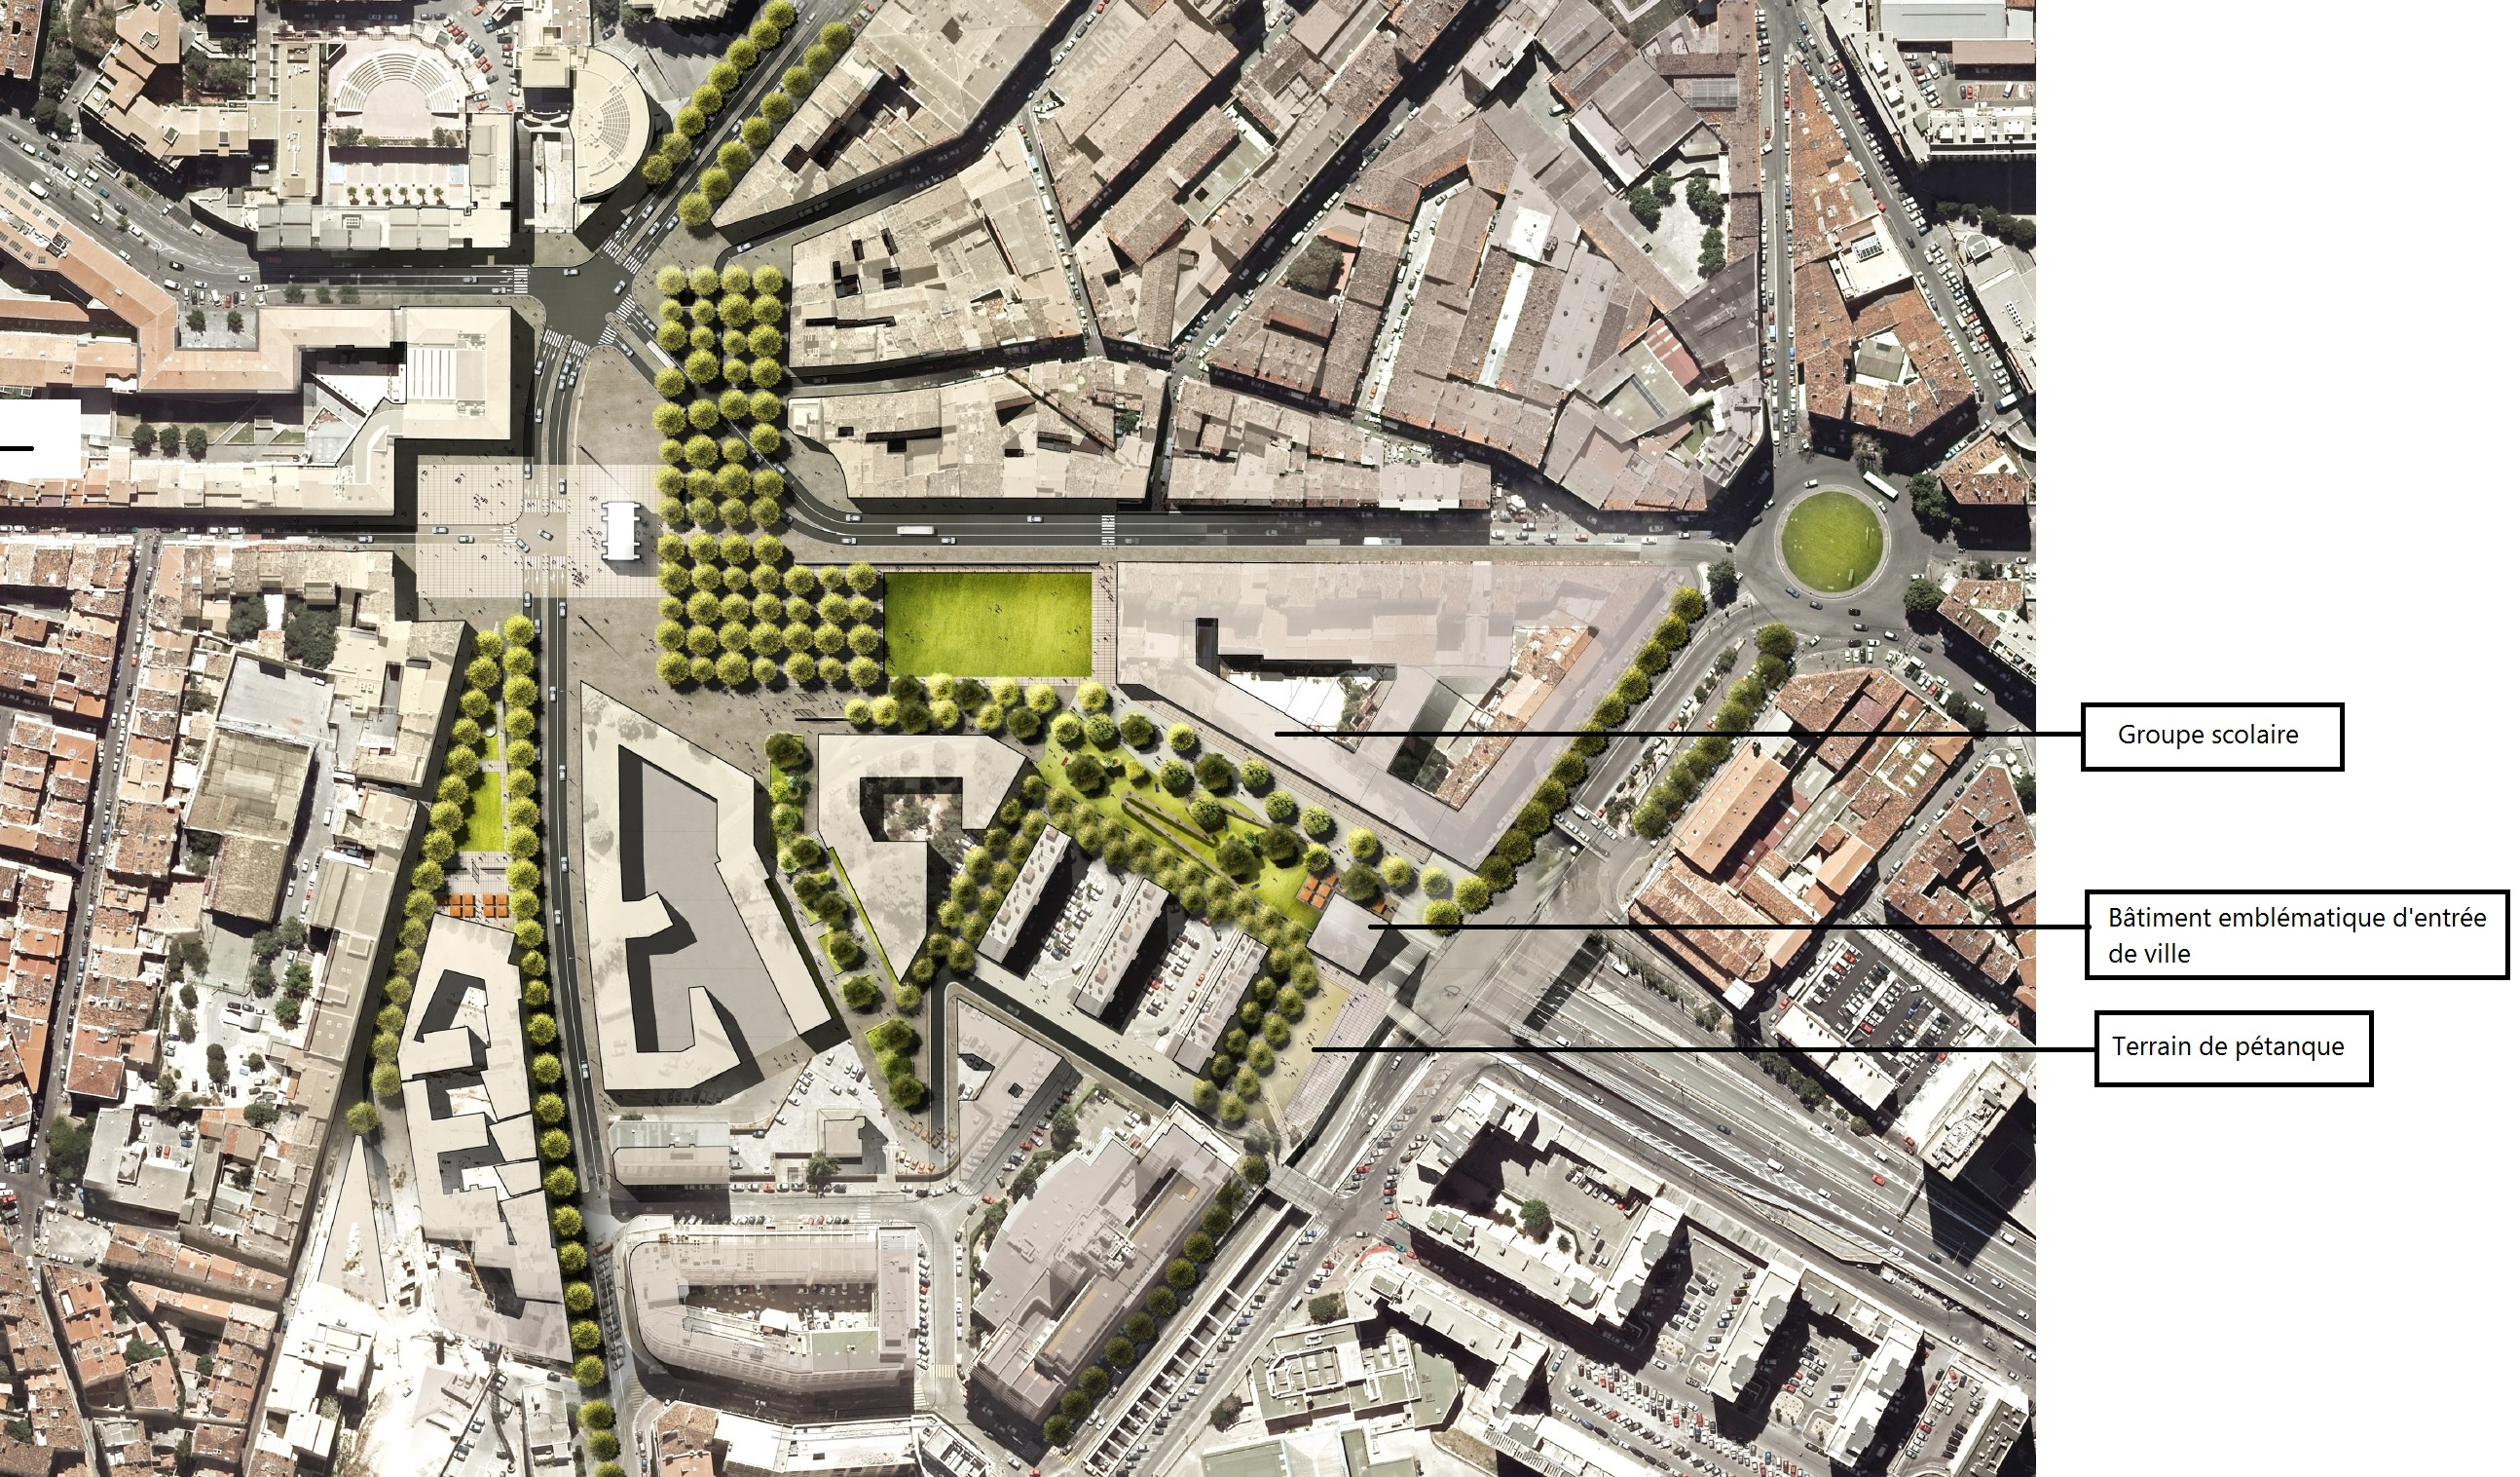 Saint-Charles, La transformation s'accélère côté Saint-Charles – Porte d'Aix, Made in Marseille, Made in Marseille